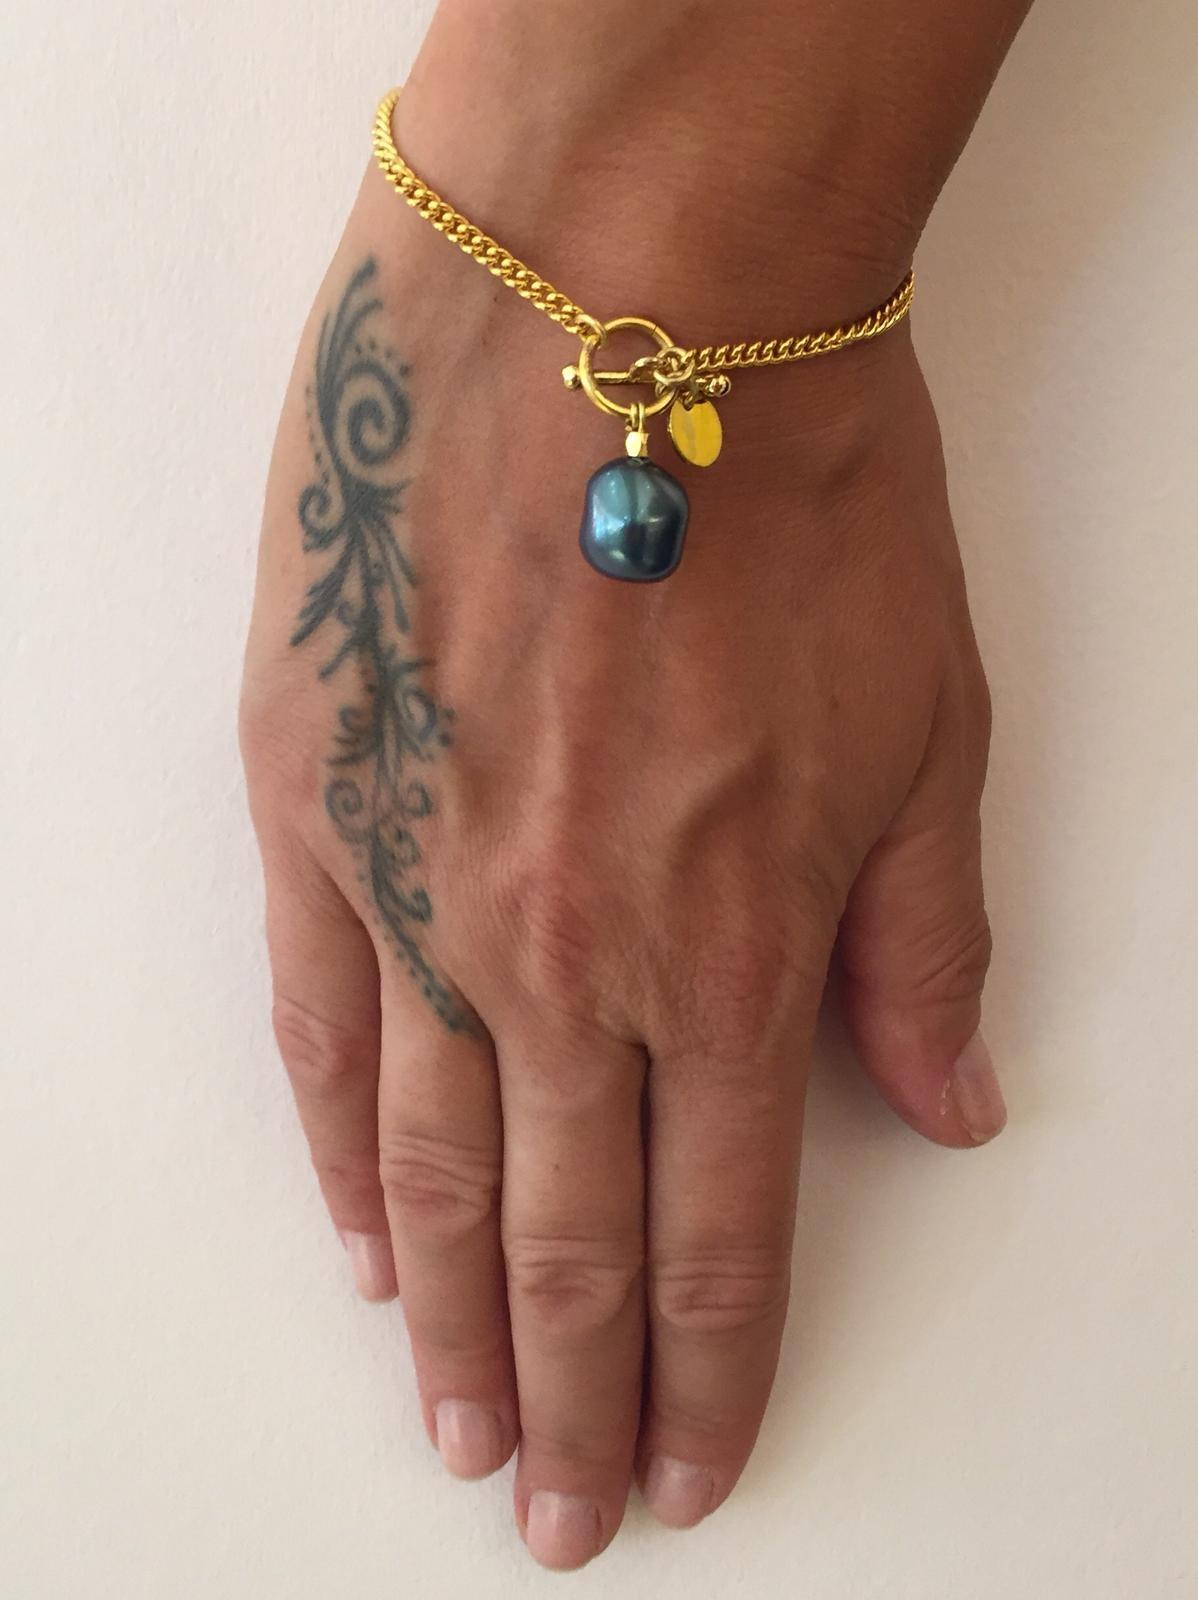 Armband mit grüner Perle